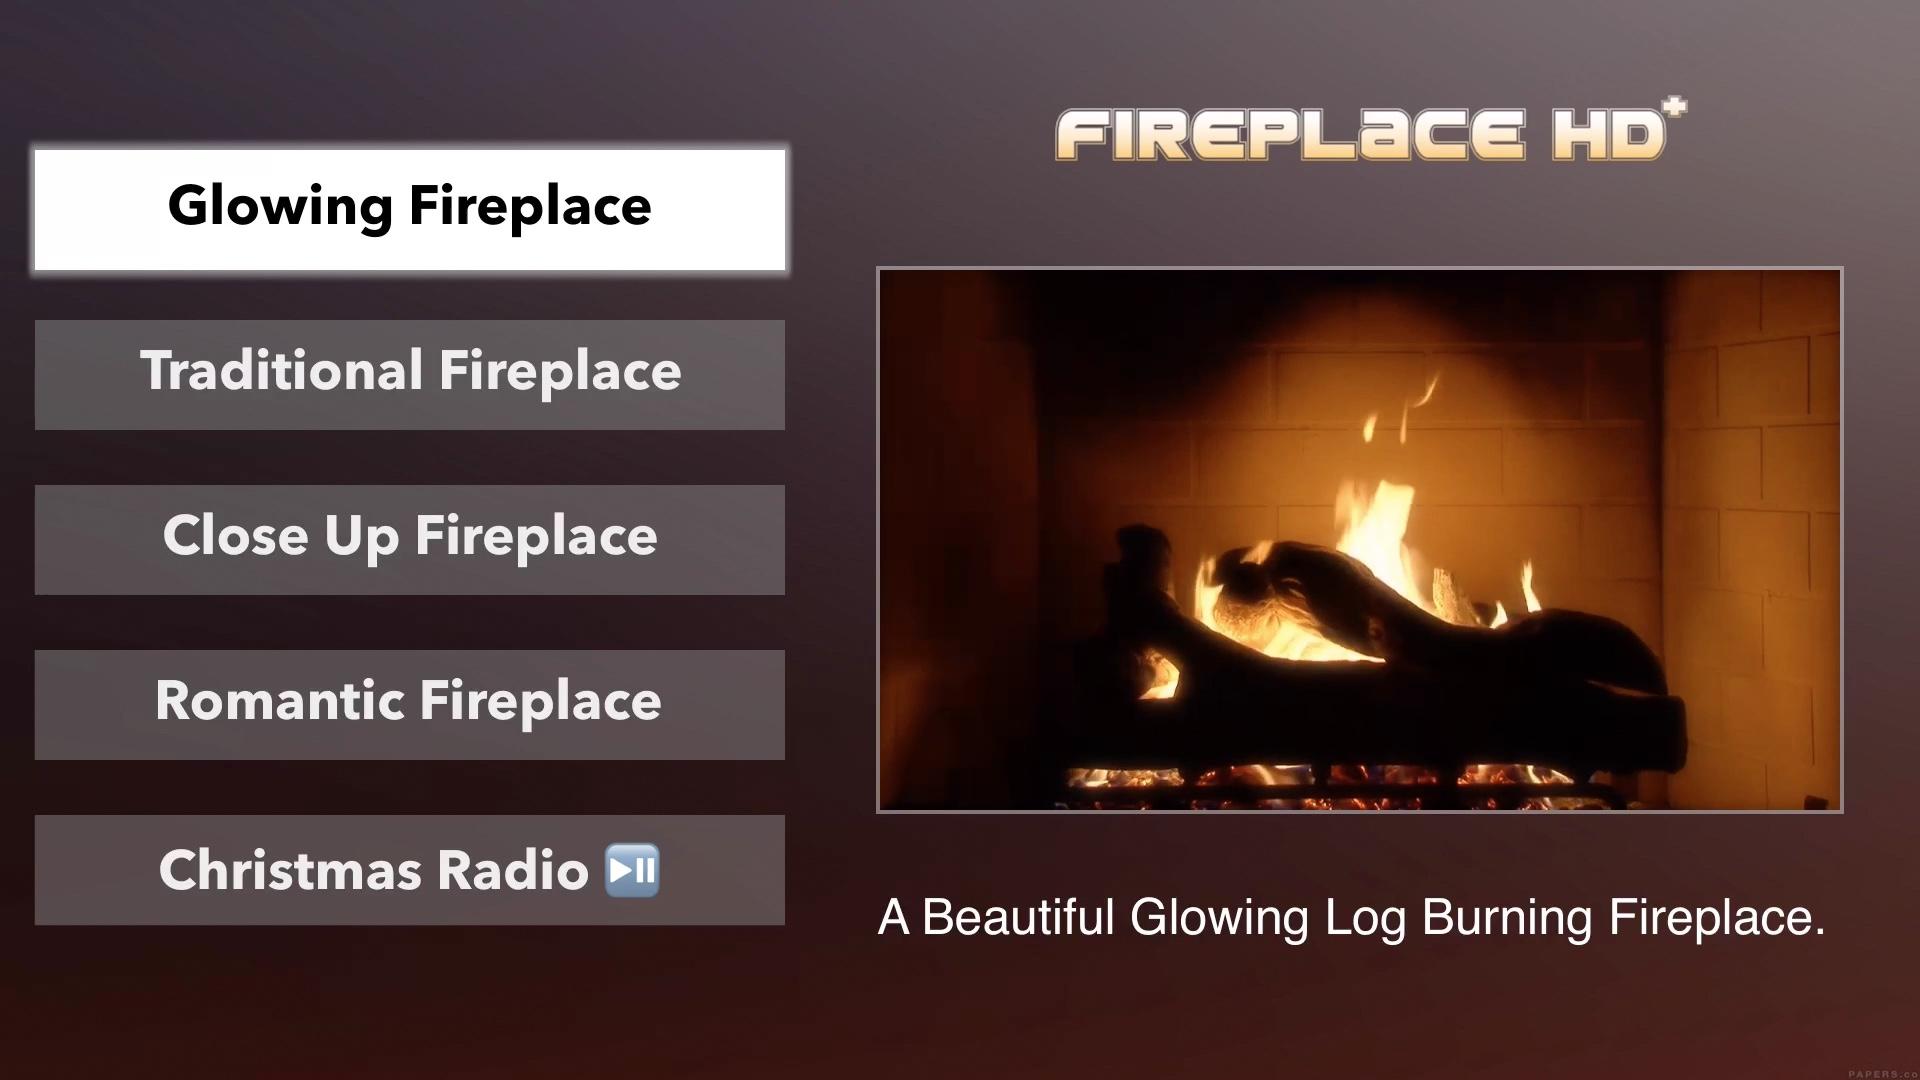 Fireplace HD Plus Apple TV